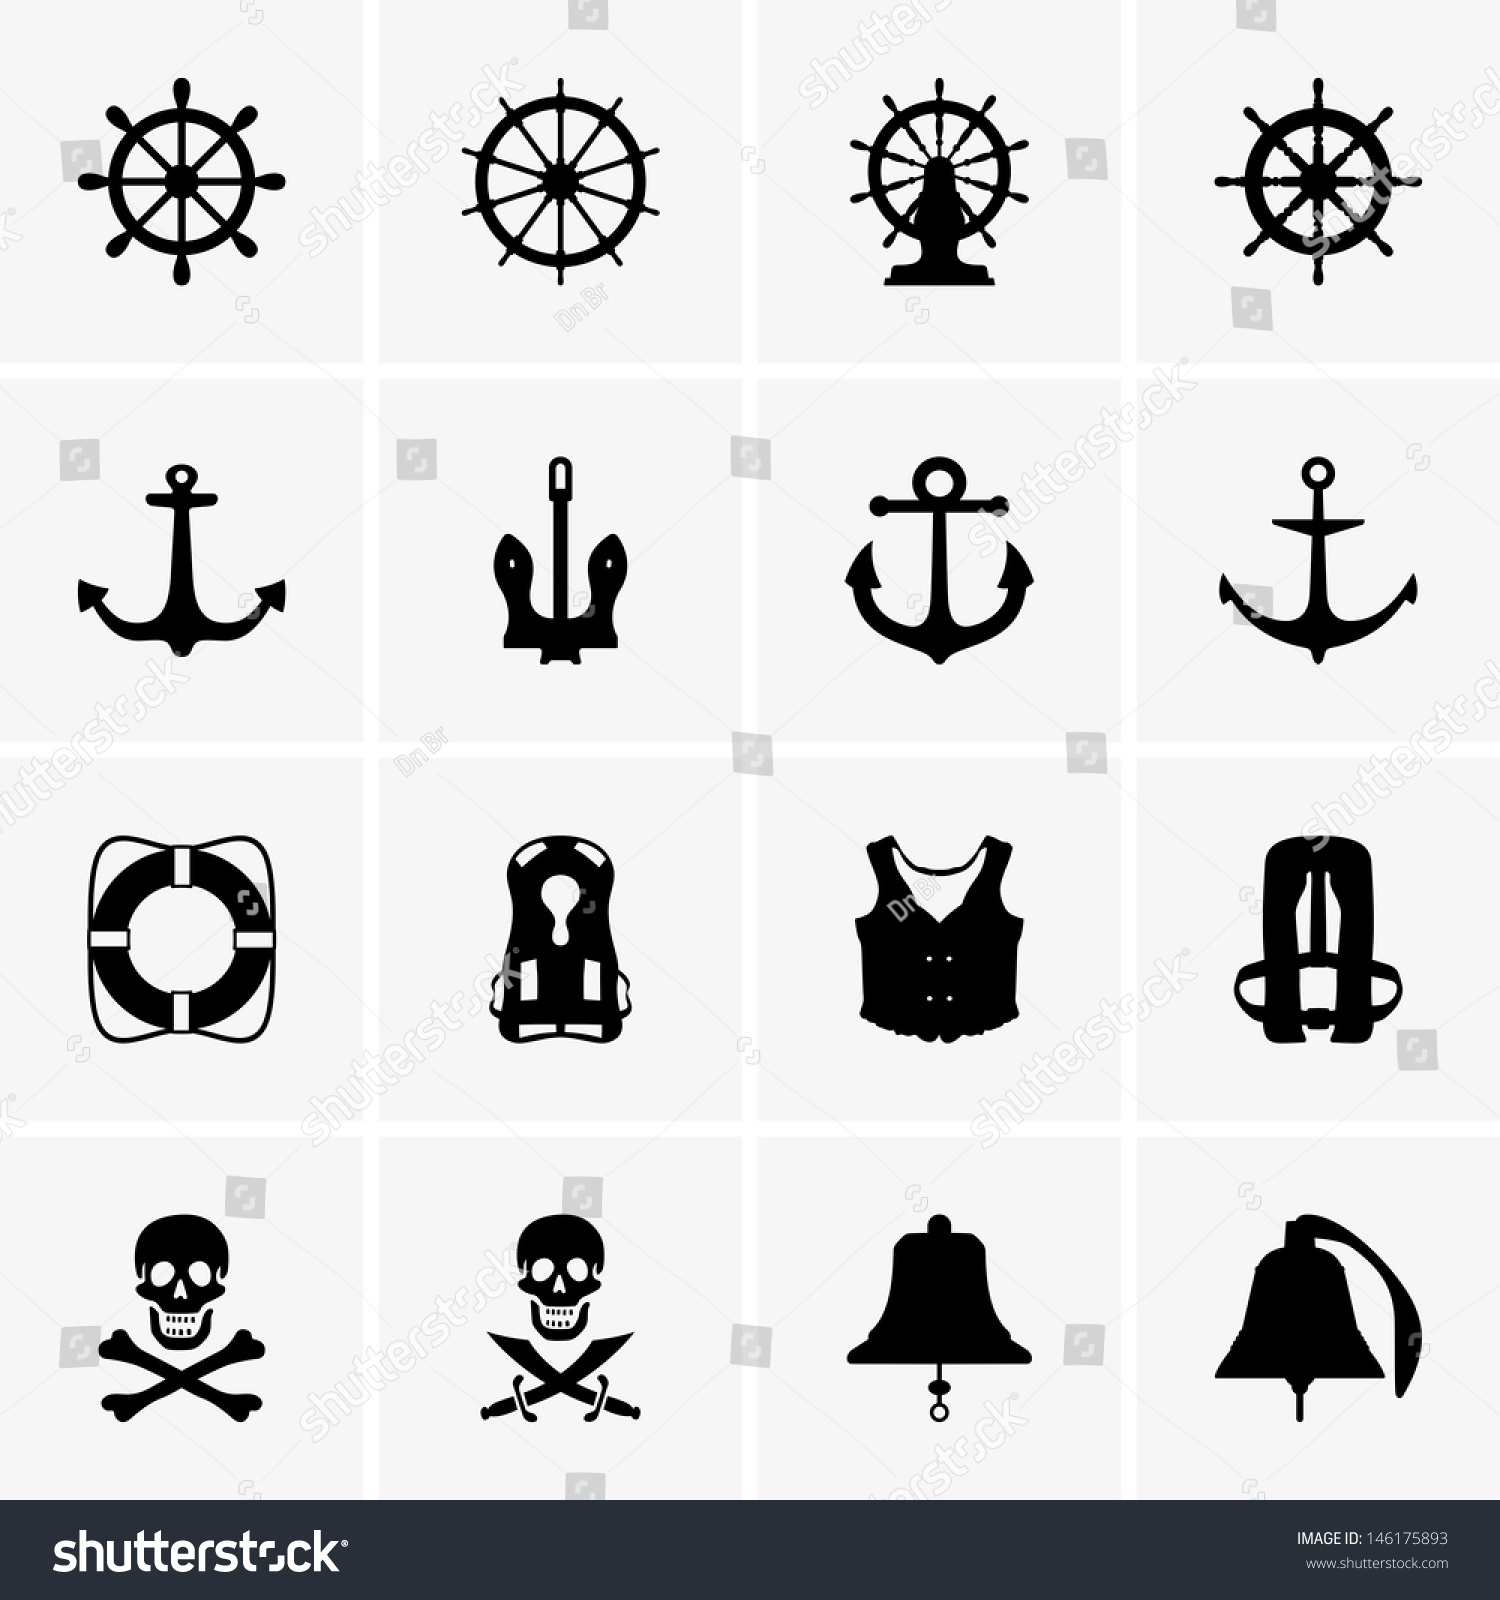 Anchors Wheels Other Stock Vector 146175893 - Shutterstock